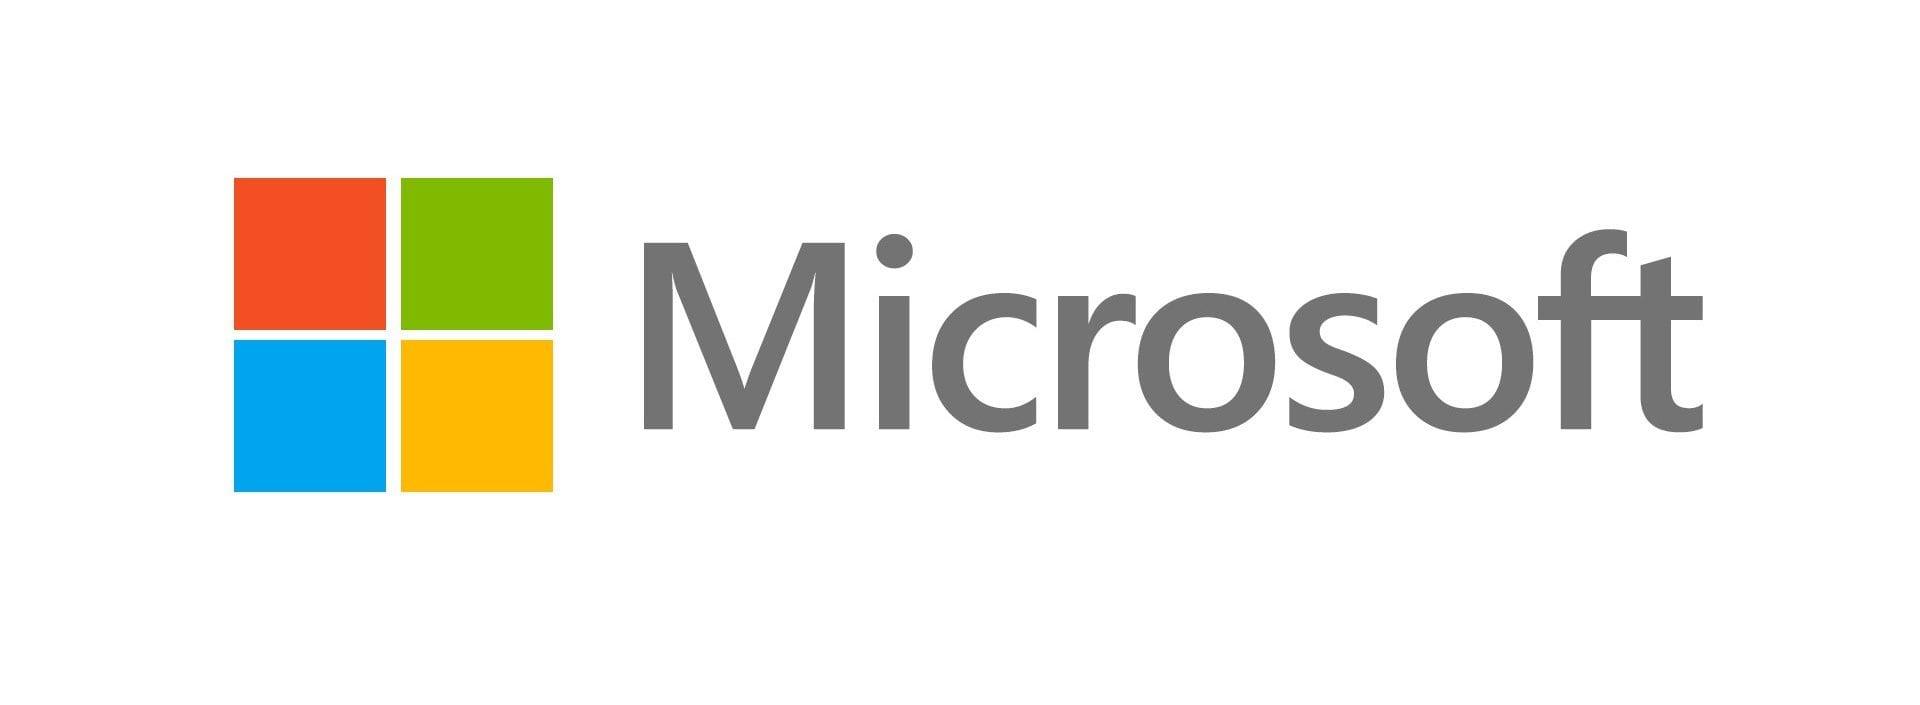 Microsoft CEO Satya Nadella Now Confirmed As Company's Chairman